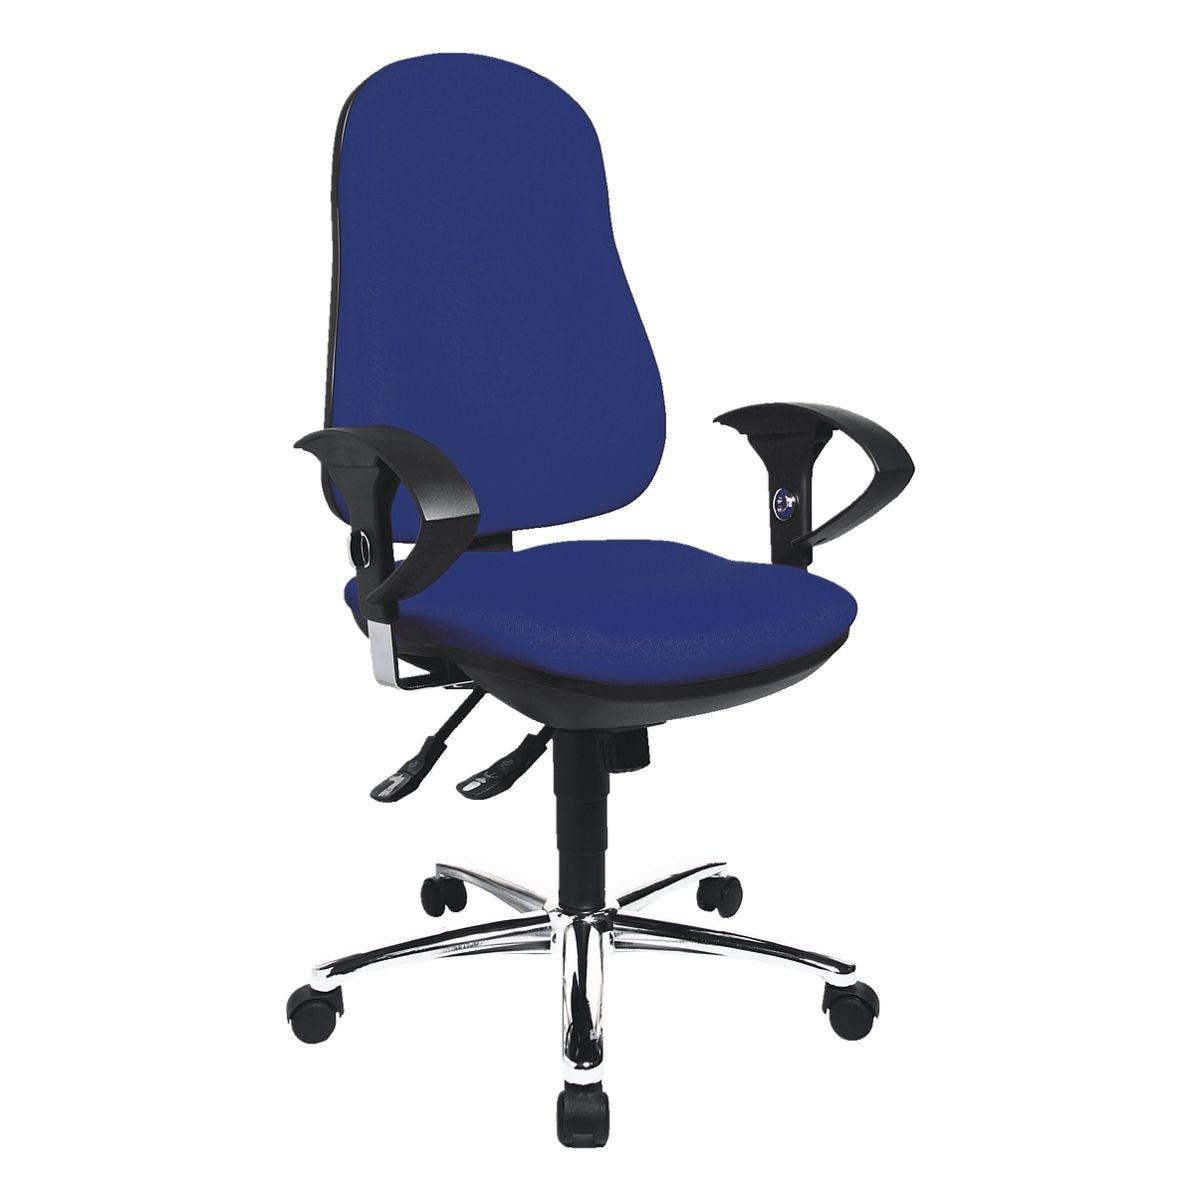 chaise / siège de bureau Topstar »Support Deluxe« avec accoudoirs